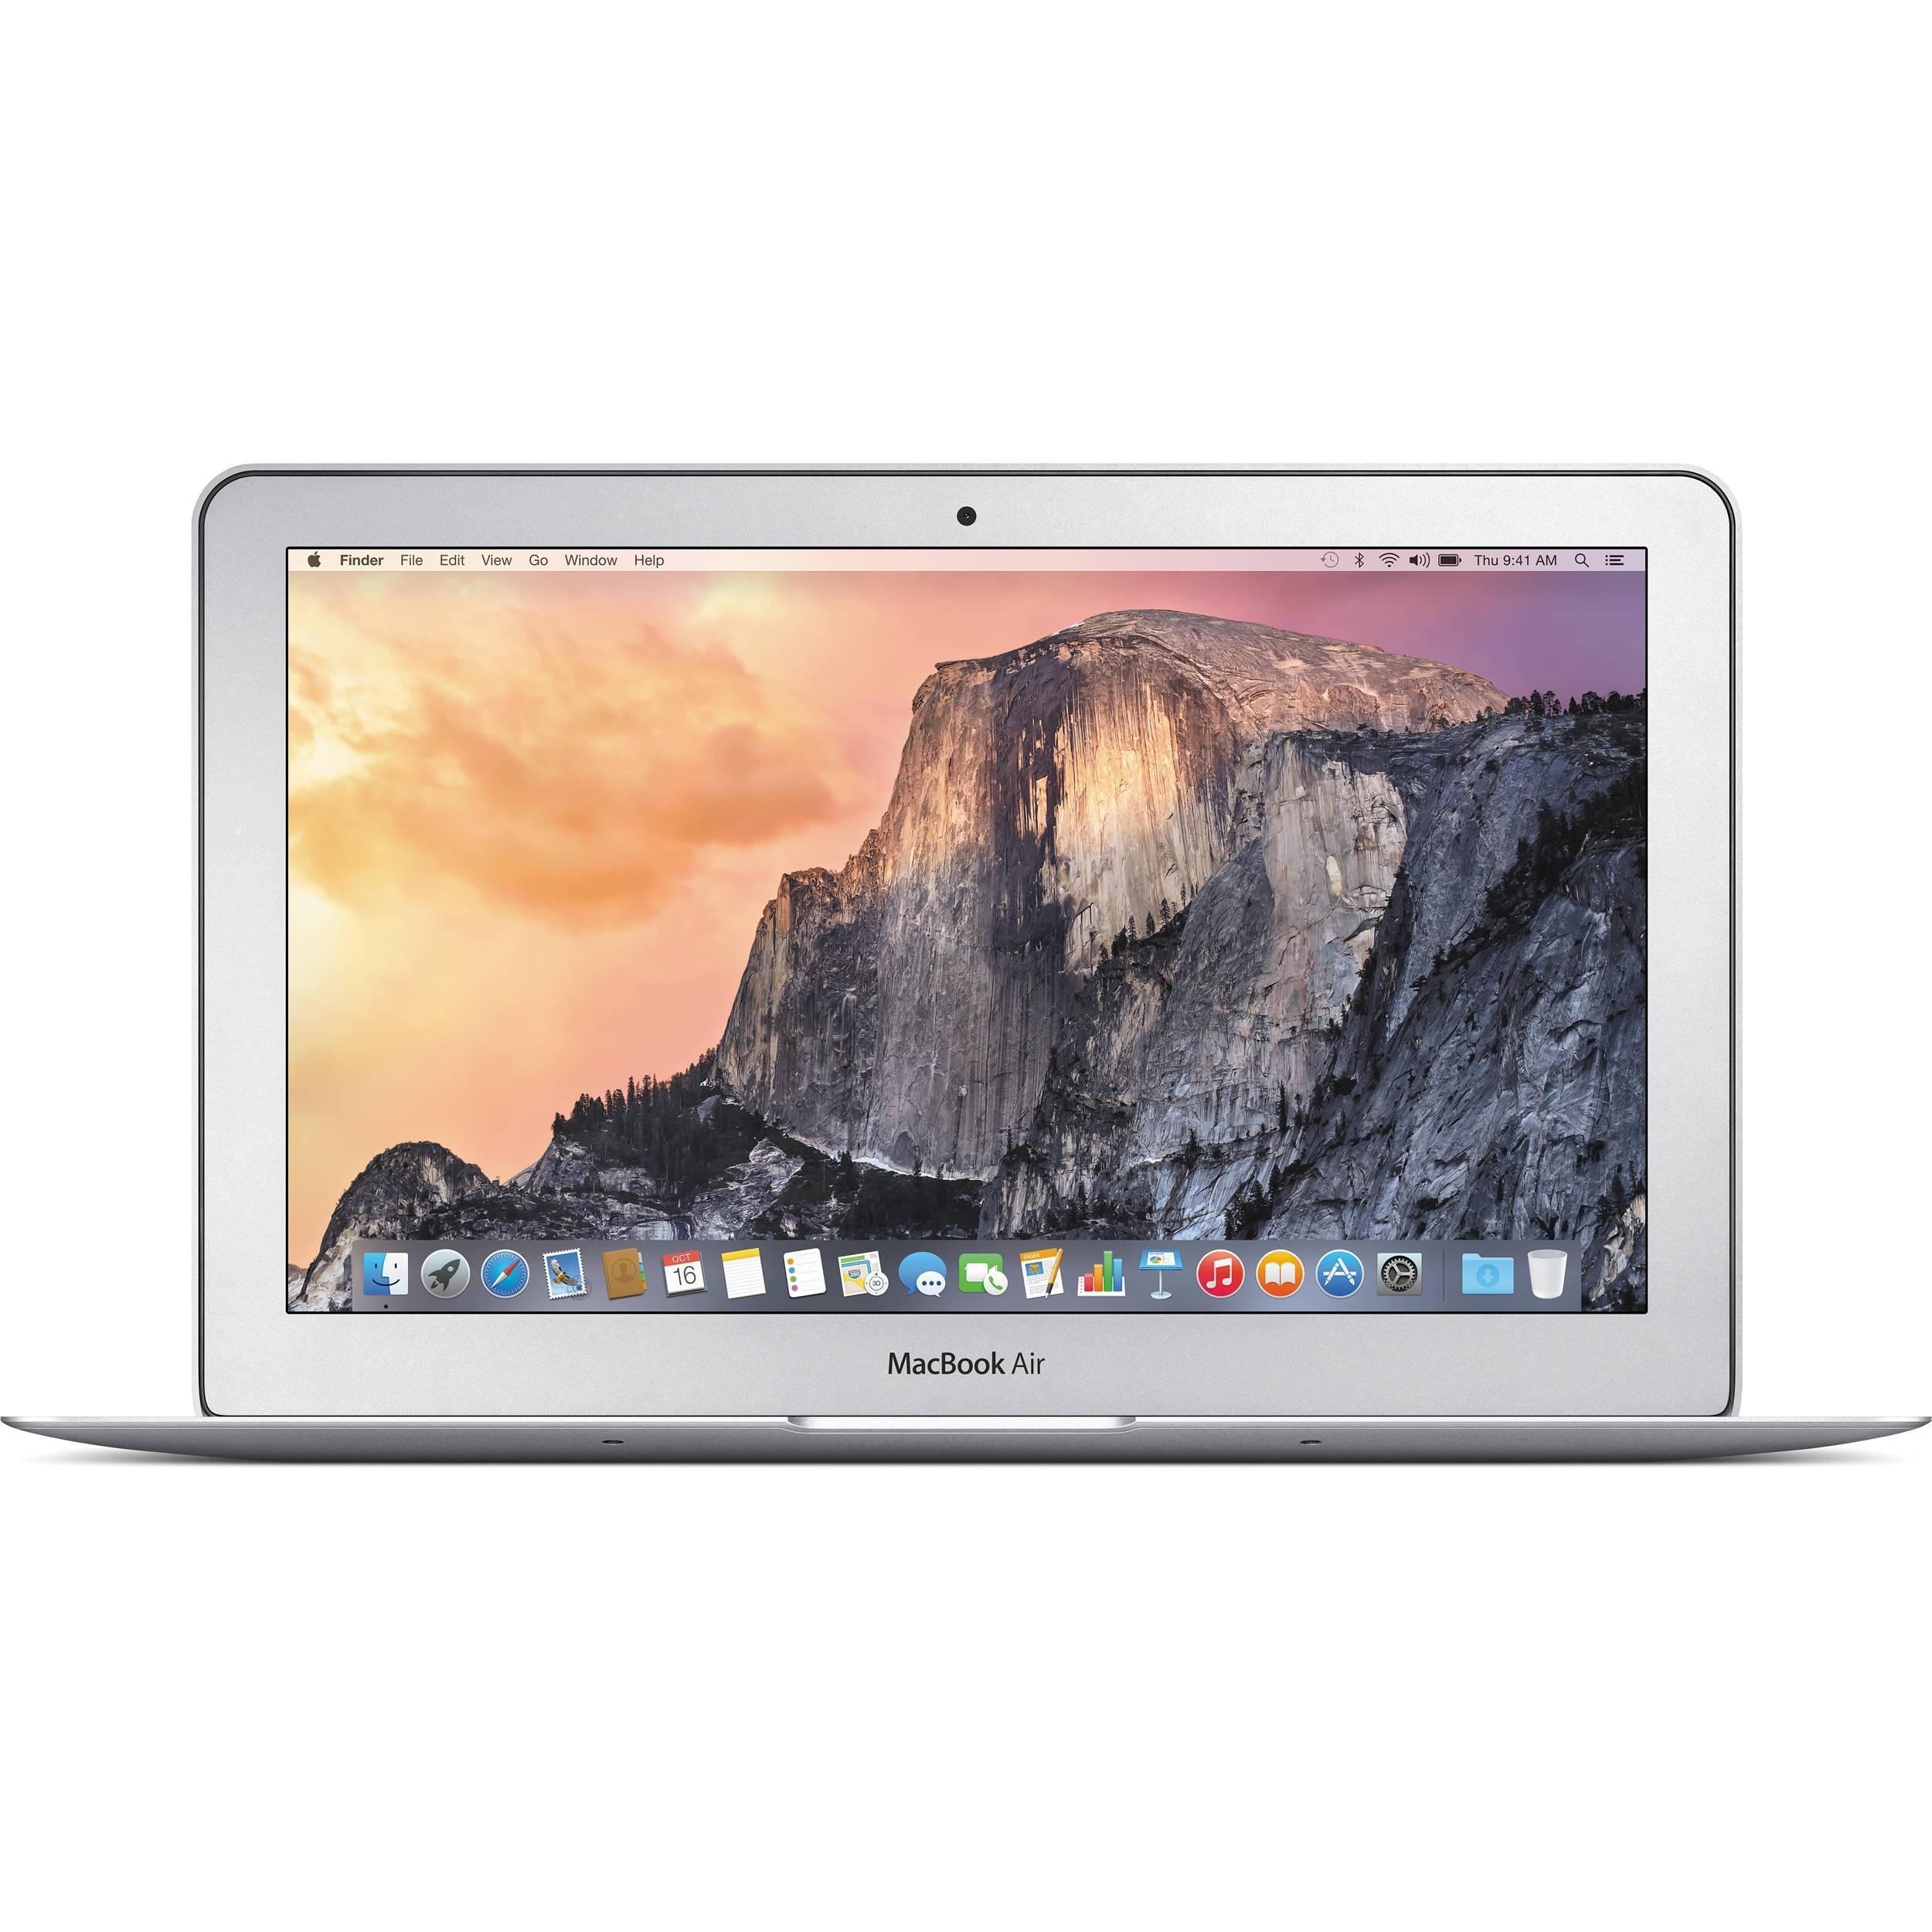 MacBook Air 11,6-tum (2012) - Core i5 - 4GB - SSD 128 GB AZERTY - Fransk